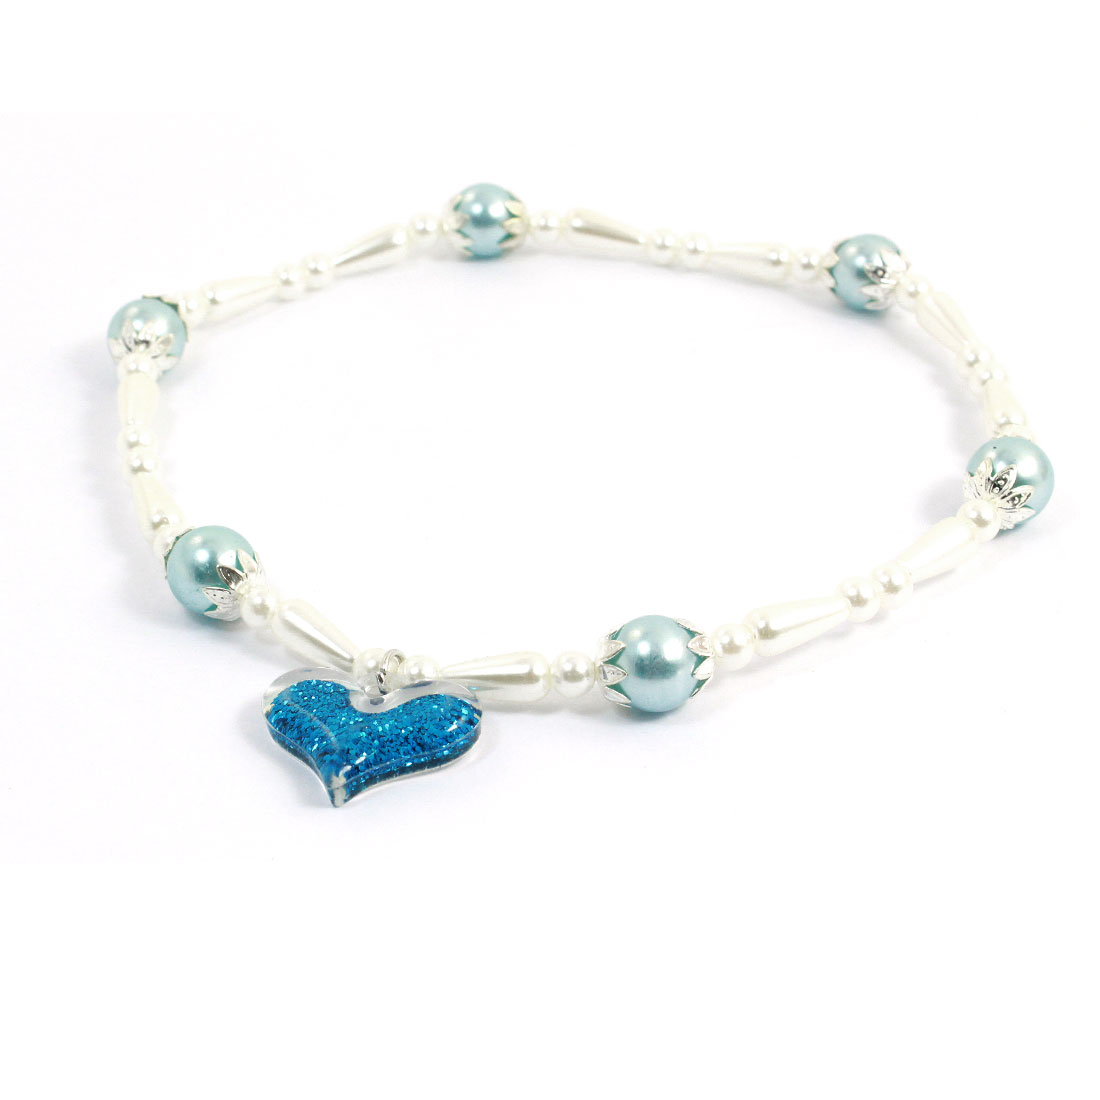 Heart Shape Pendant Decor Plastic Beads Linked Stretchy Pet Dog Necklace L Blue